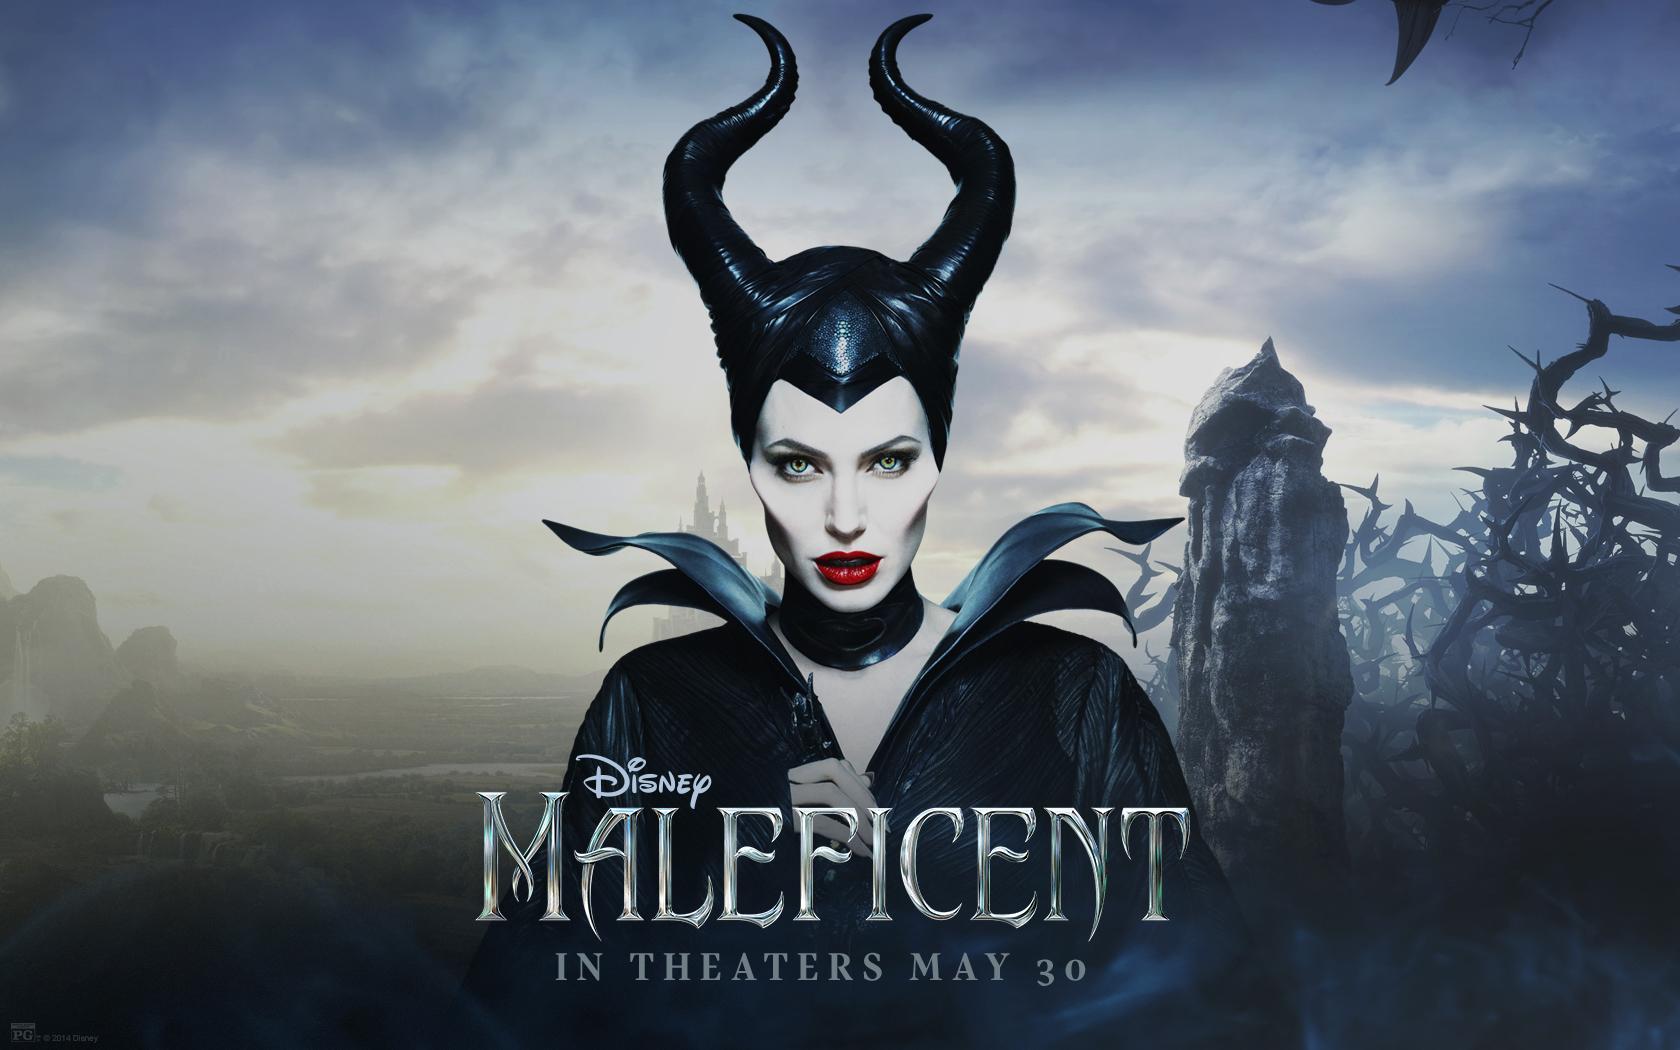 Maleficent Movie 2014 Hd Ipad Iphone Wallpapers: Cameronmoviesandtv